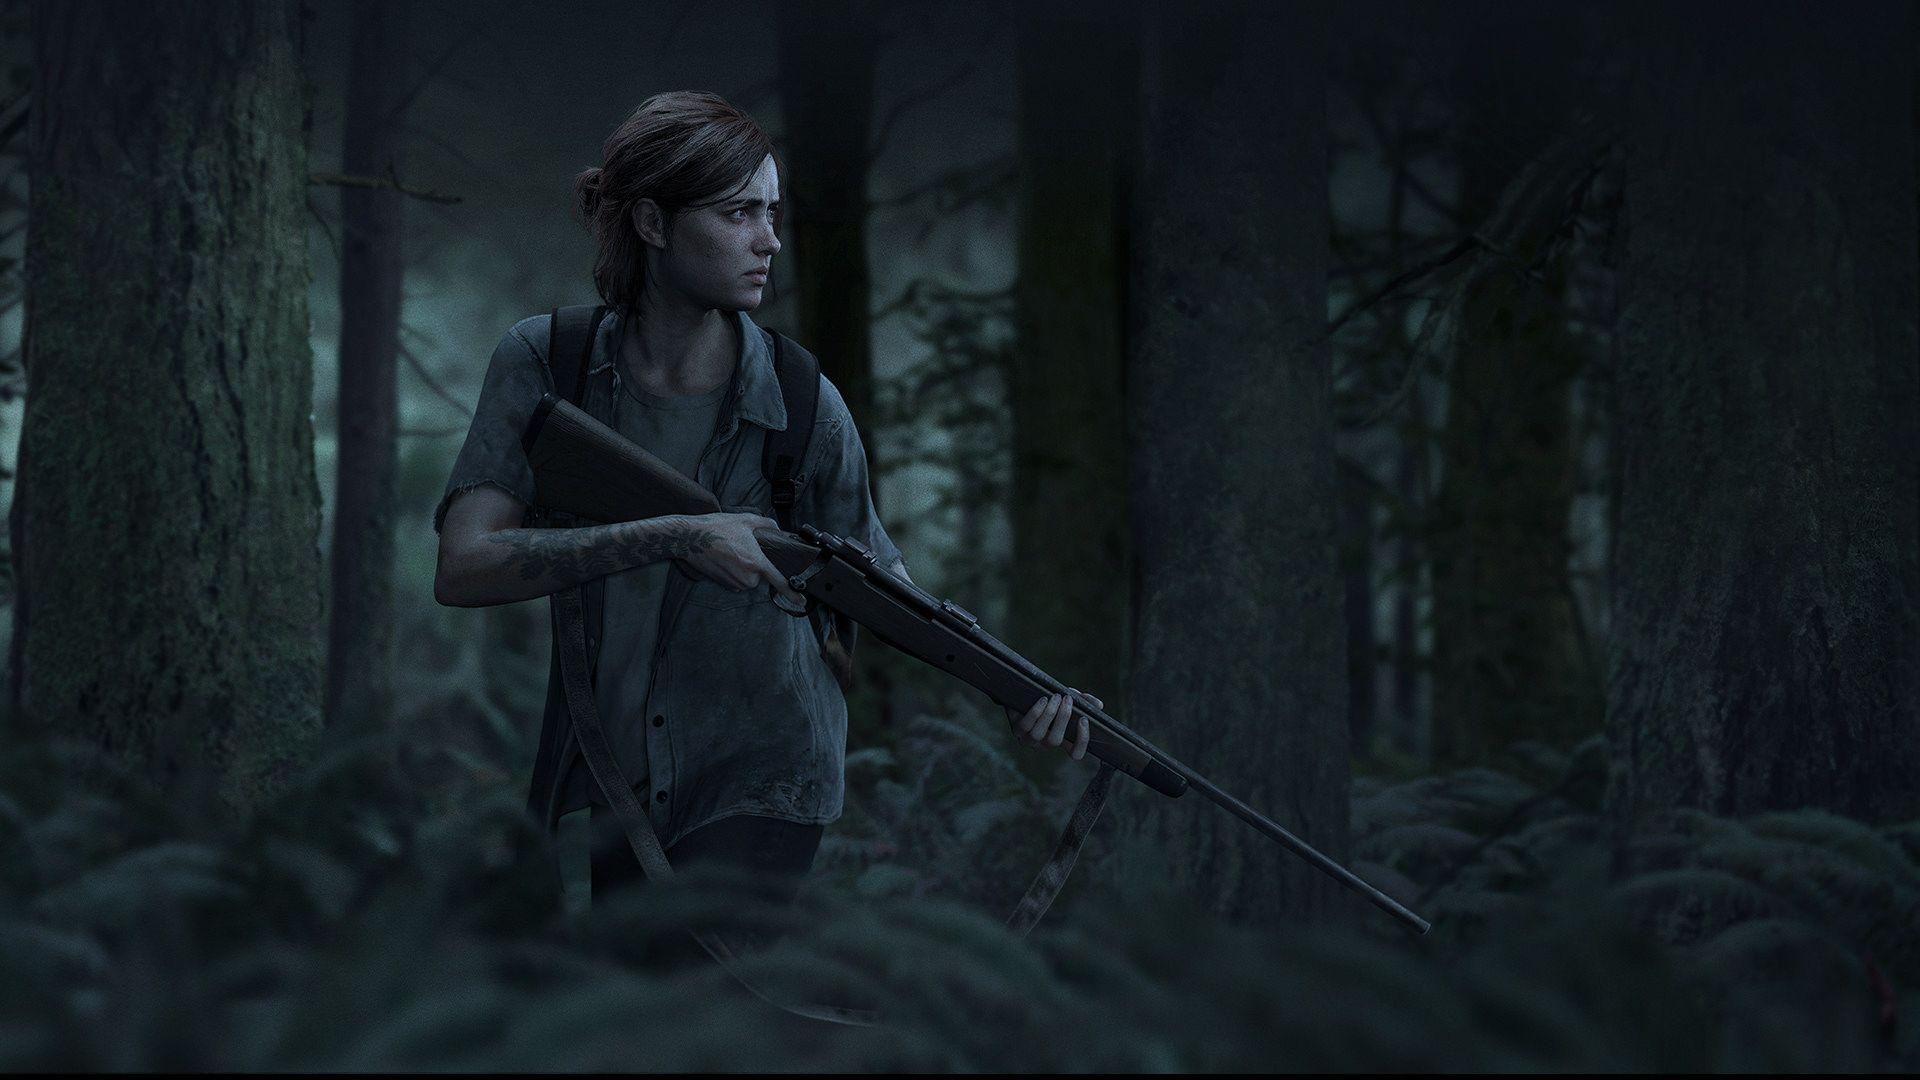 1920x1080 The Last Of Us 2 Ellie Wallpaper Need Trendy Iphone7